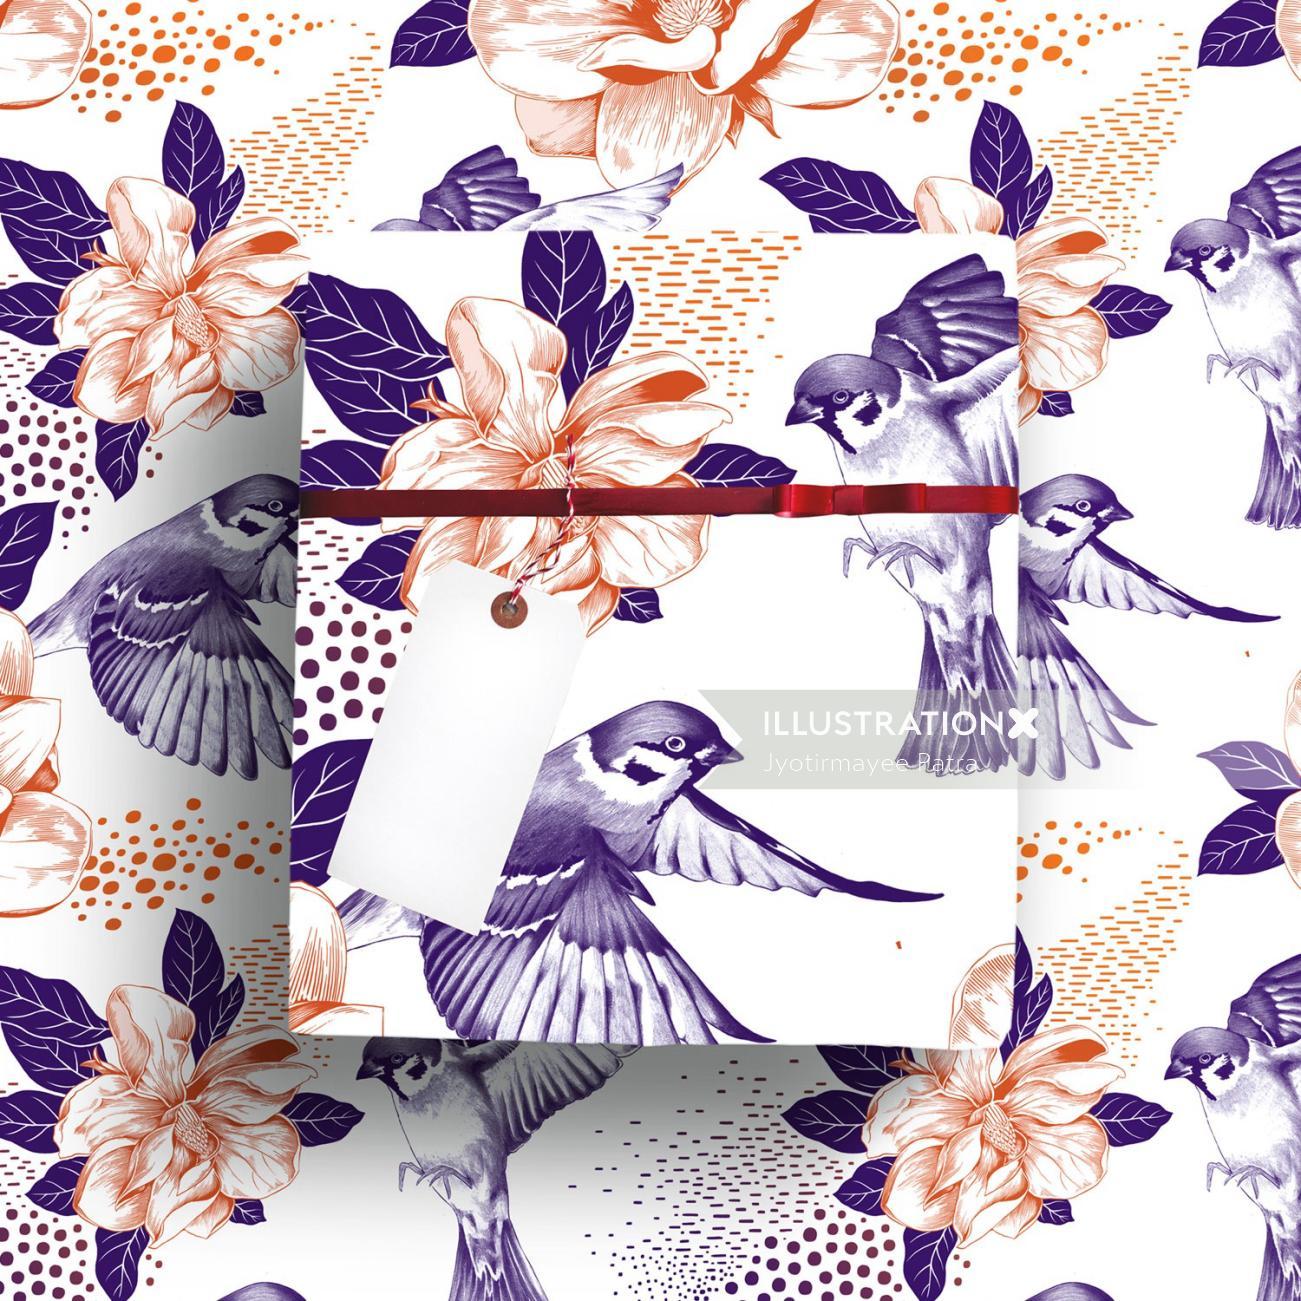 Spring & Magnolias combined botanical pattern illustration